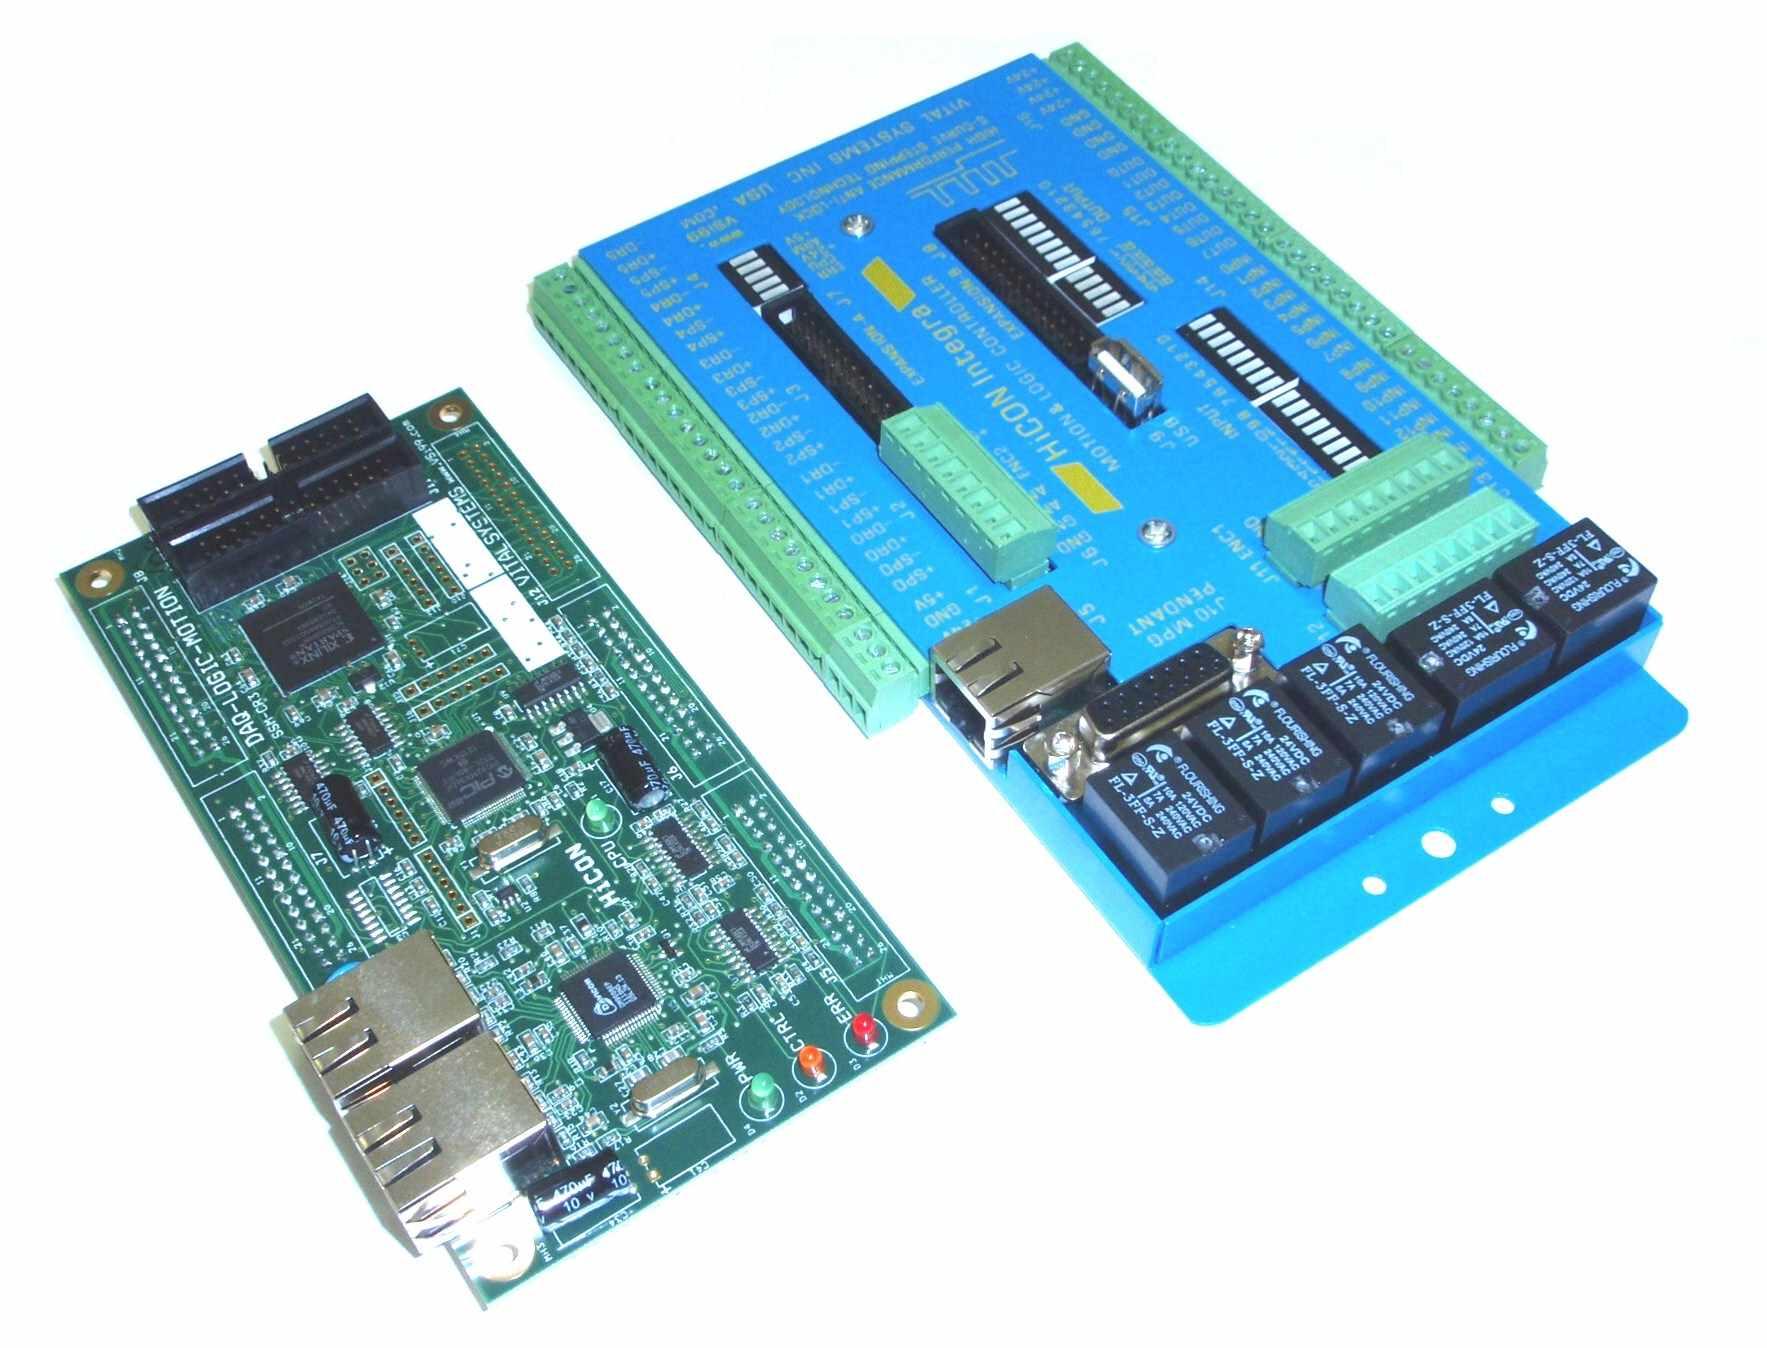 Mach3 Mach4 Ethernet Motion Controller, CNC Retrofit, Machine Tools